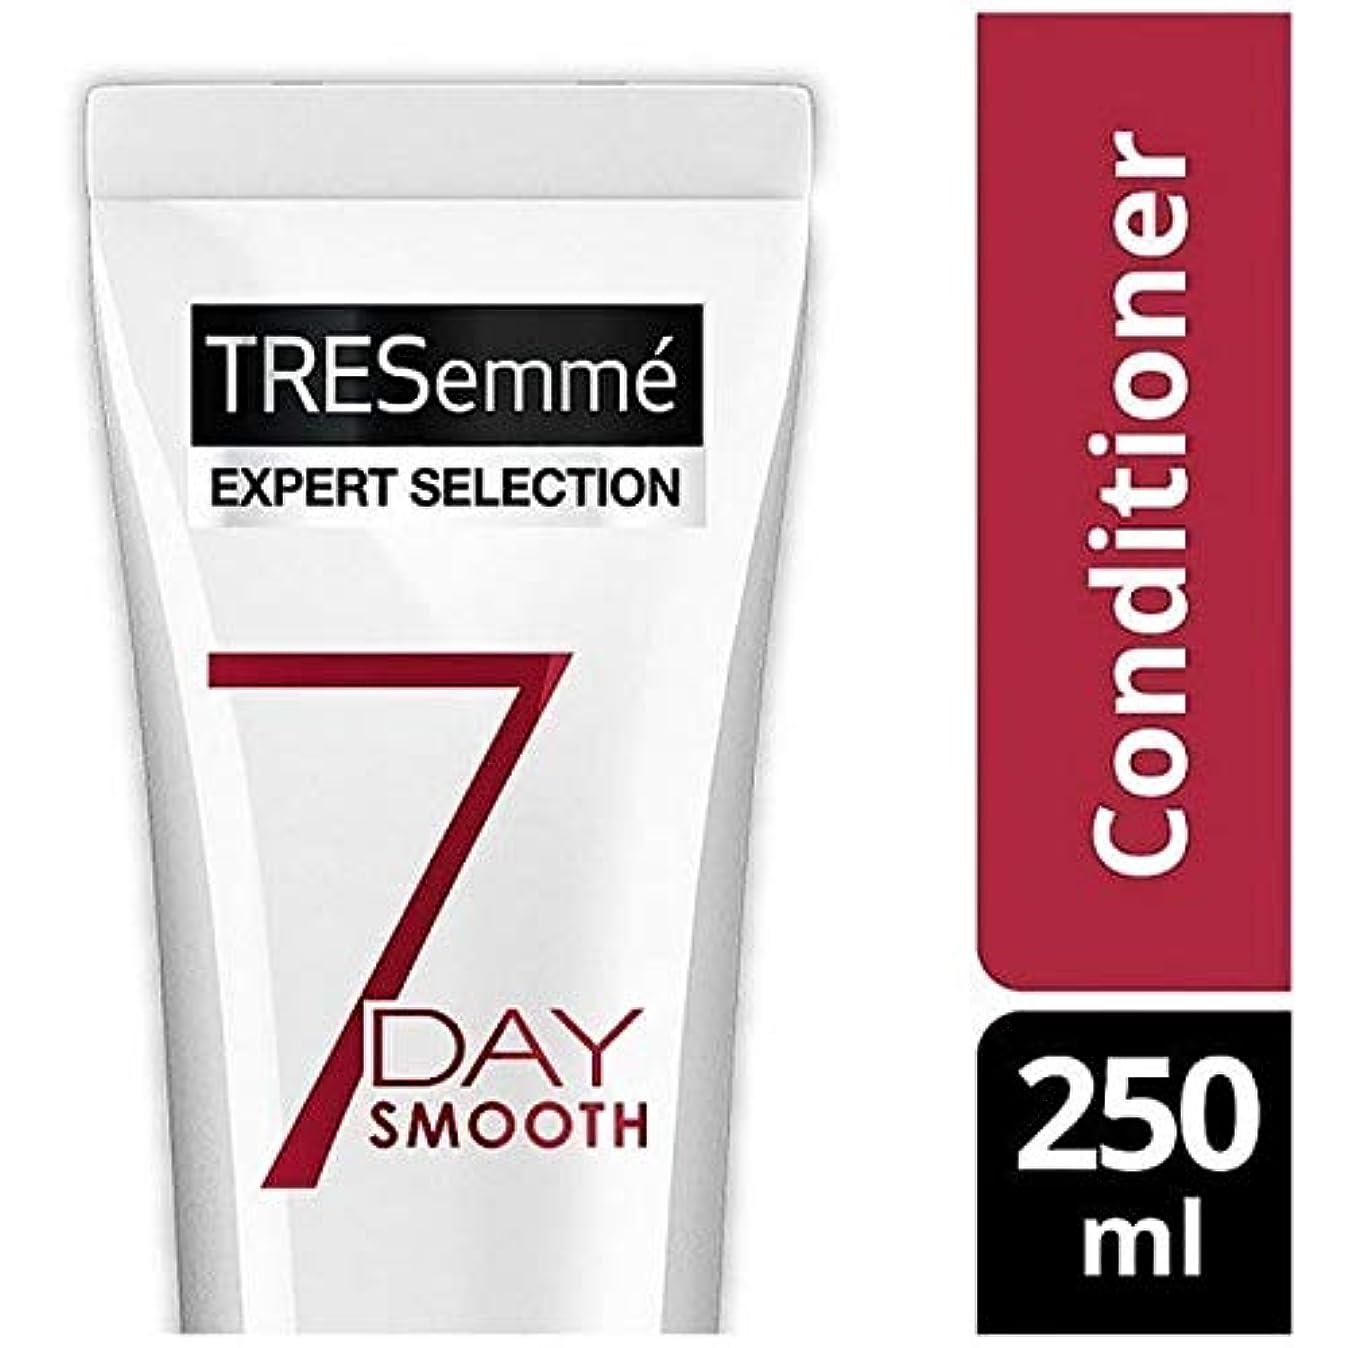 [Tresemme] Tresemmeの専門家7日スムーズコンディショナー250Ml - Tresemme Specialist 7 Day Smooth Conditioner 250ml [並行輸入品]